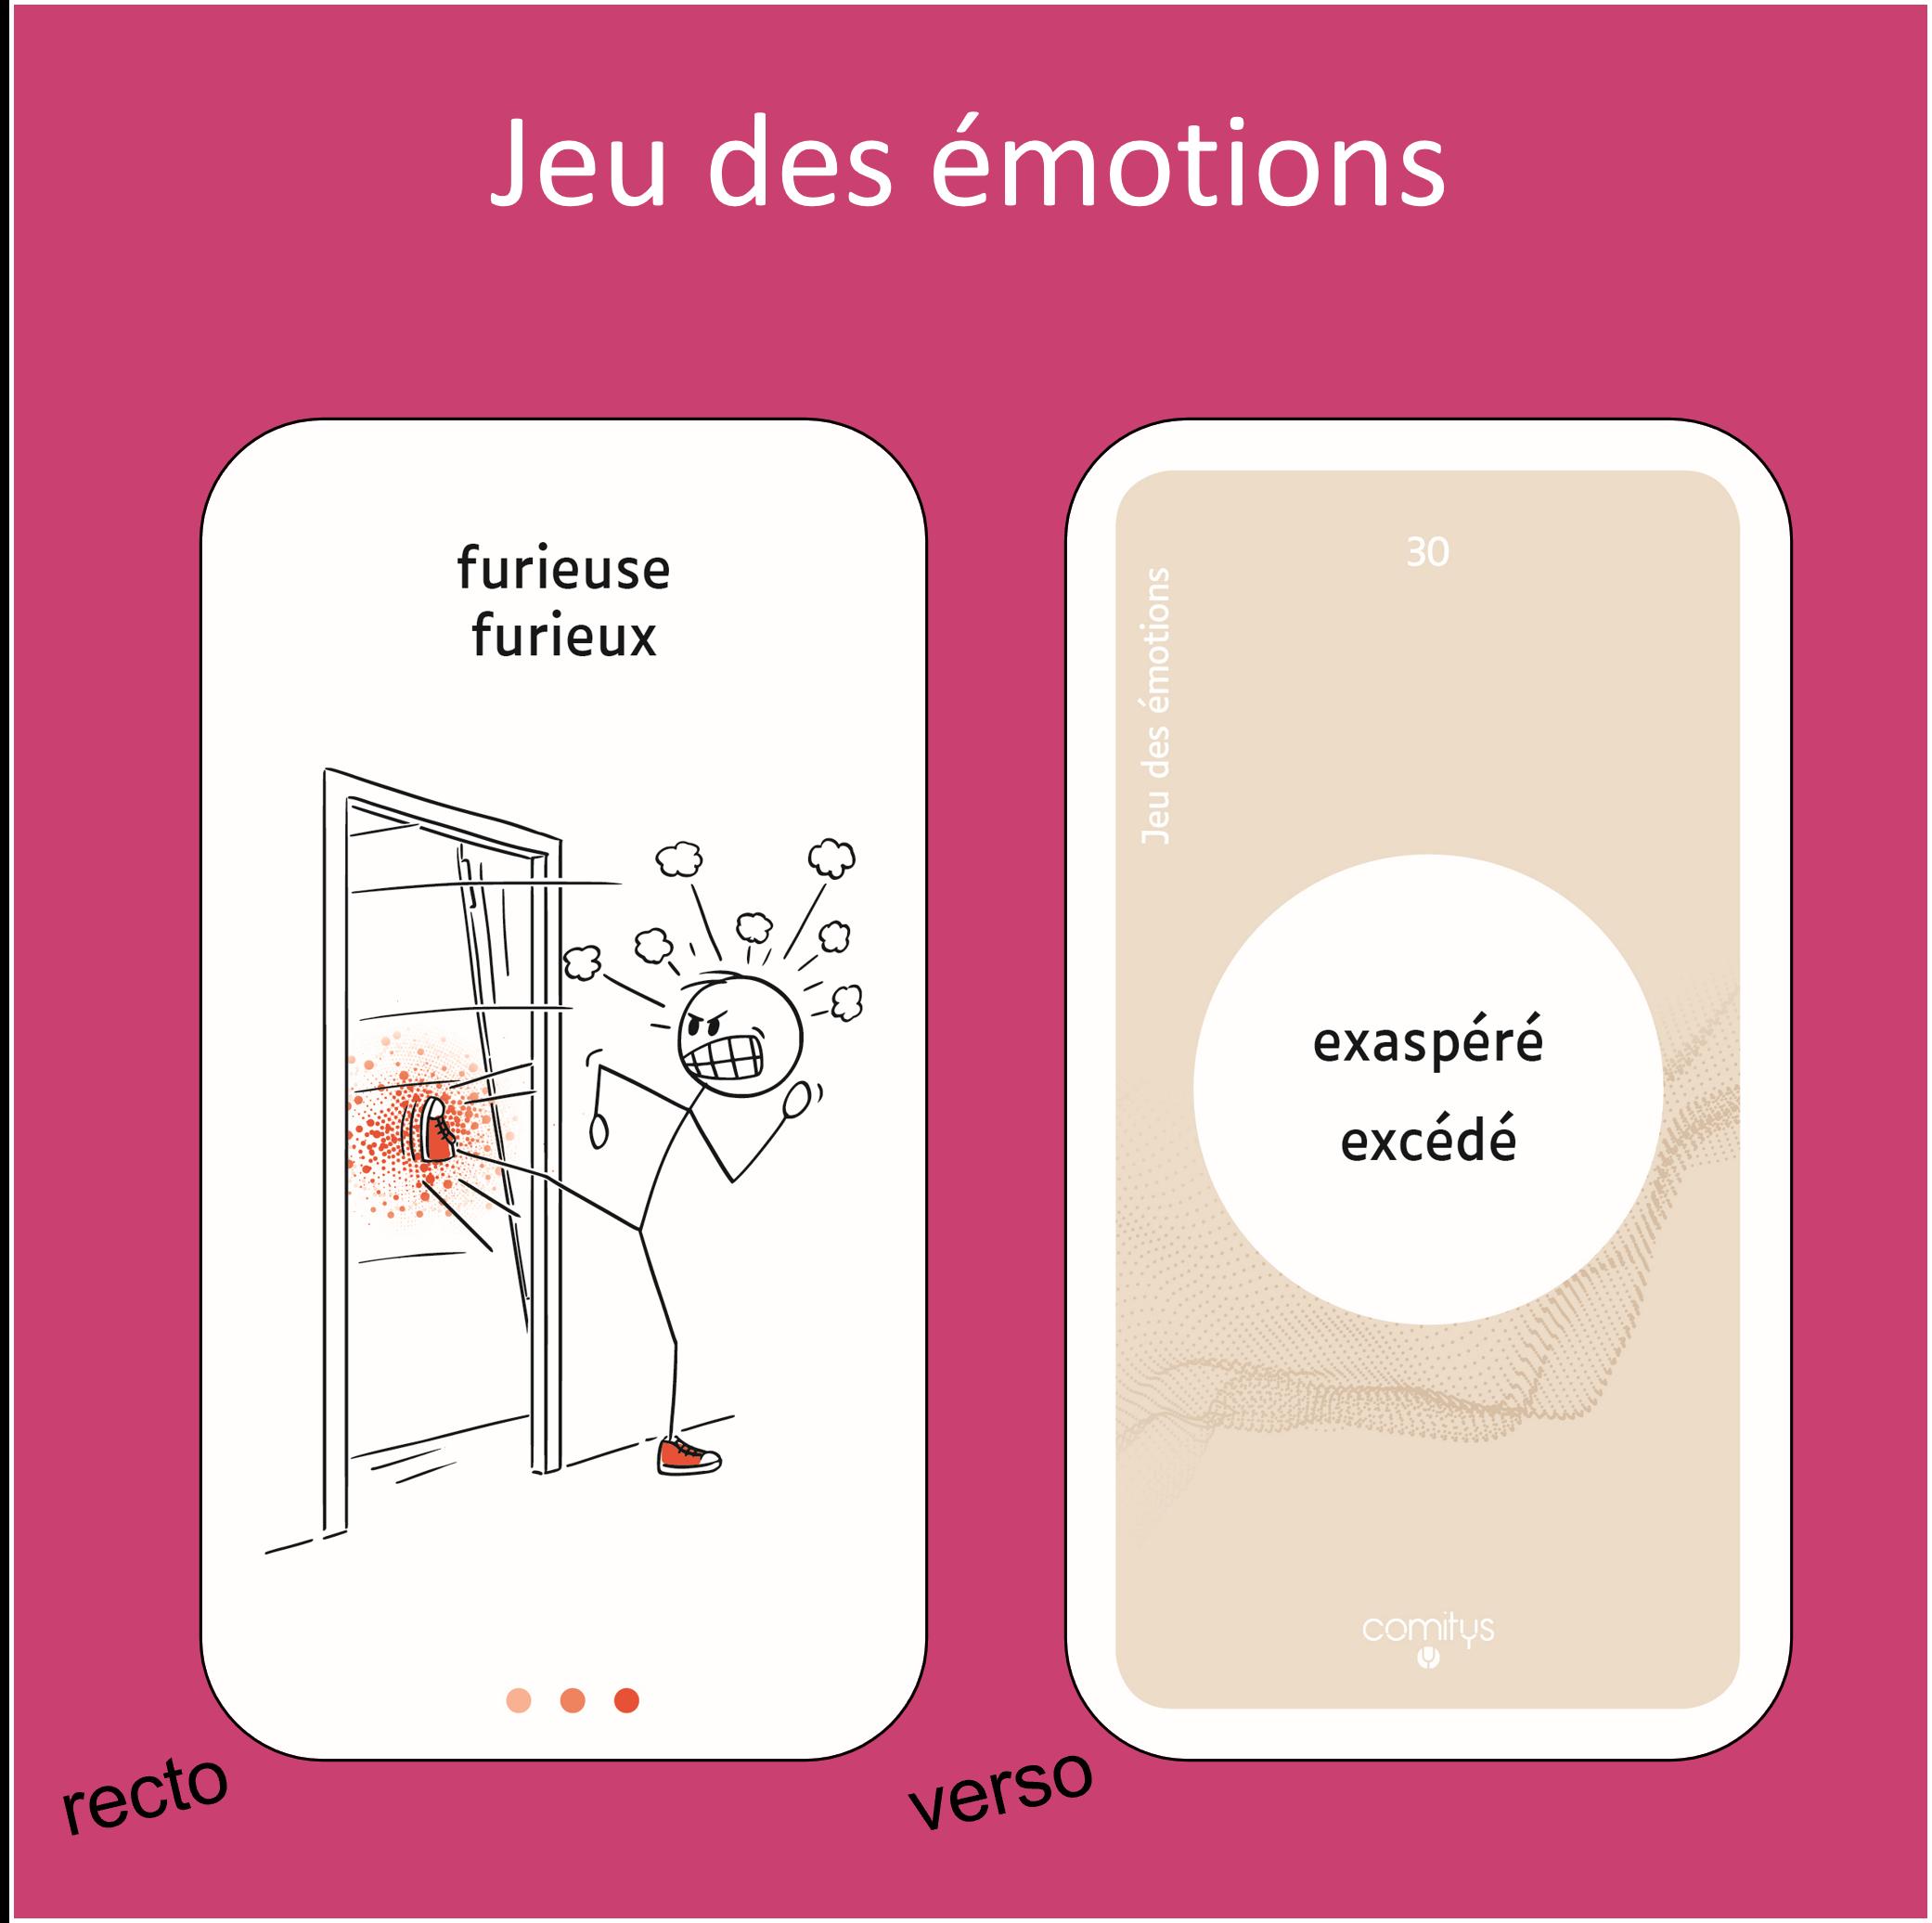 jeu-des-emotions-comitys